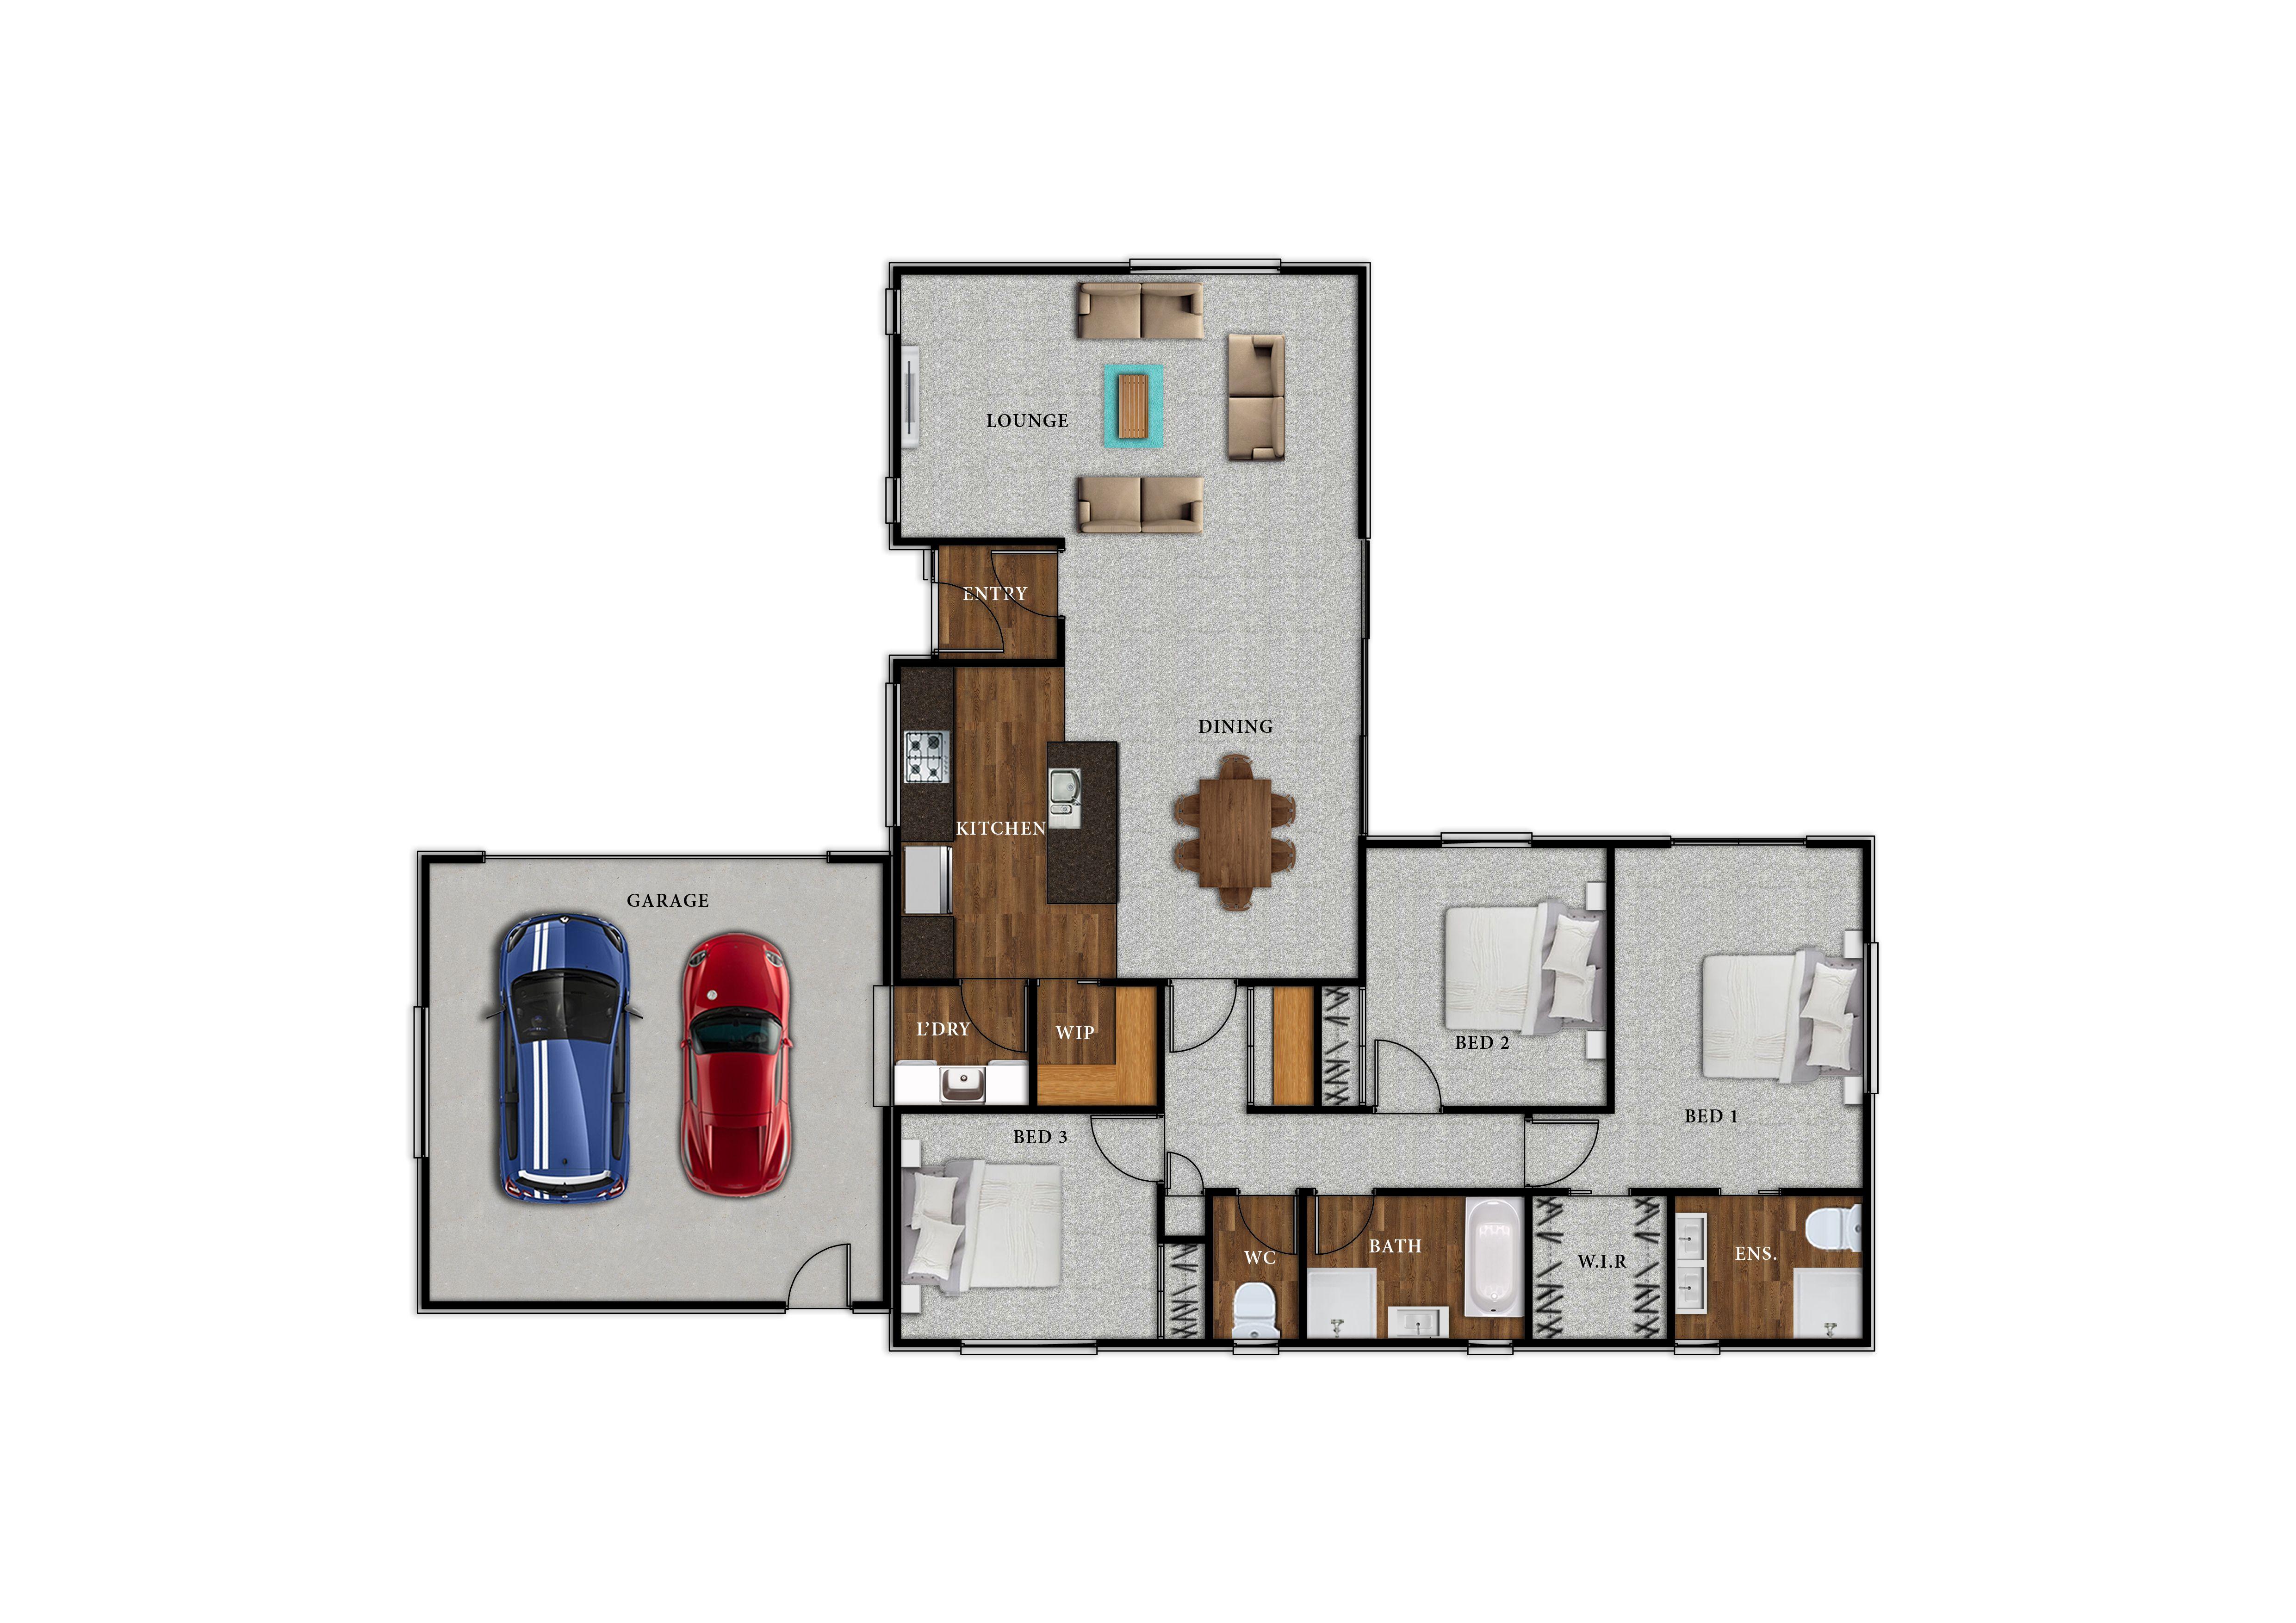 Lot 100 Brooker Ave - Floor Plan